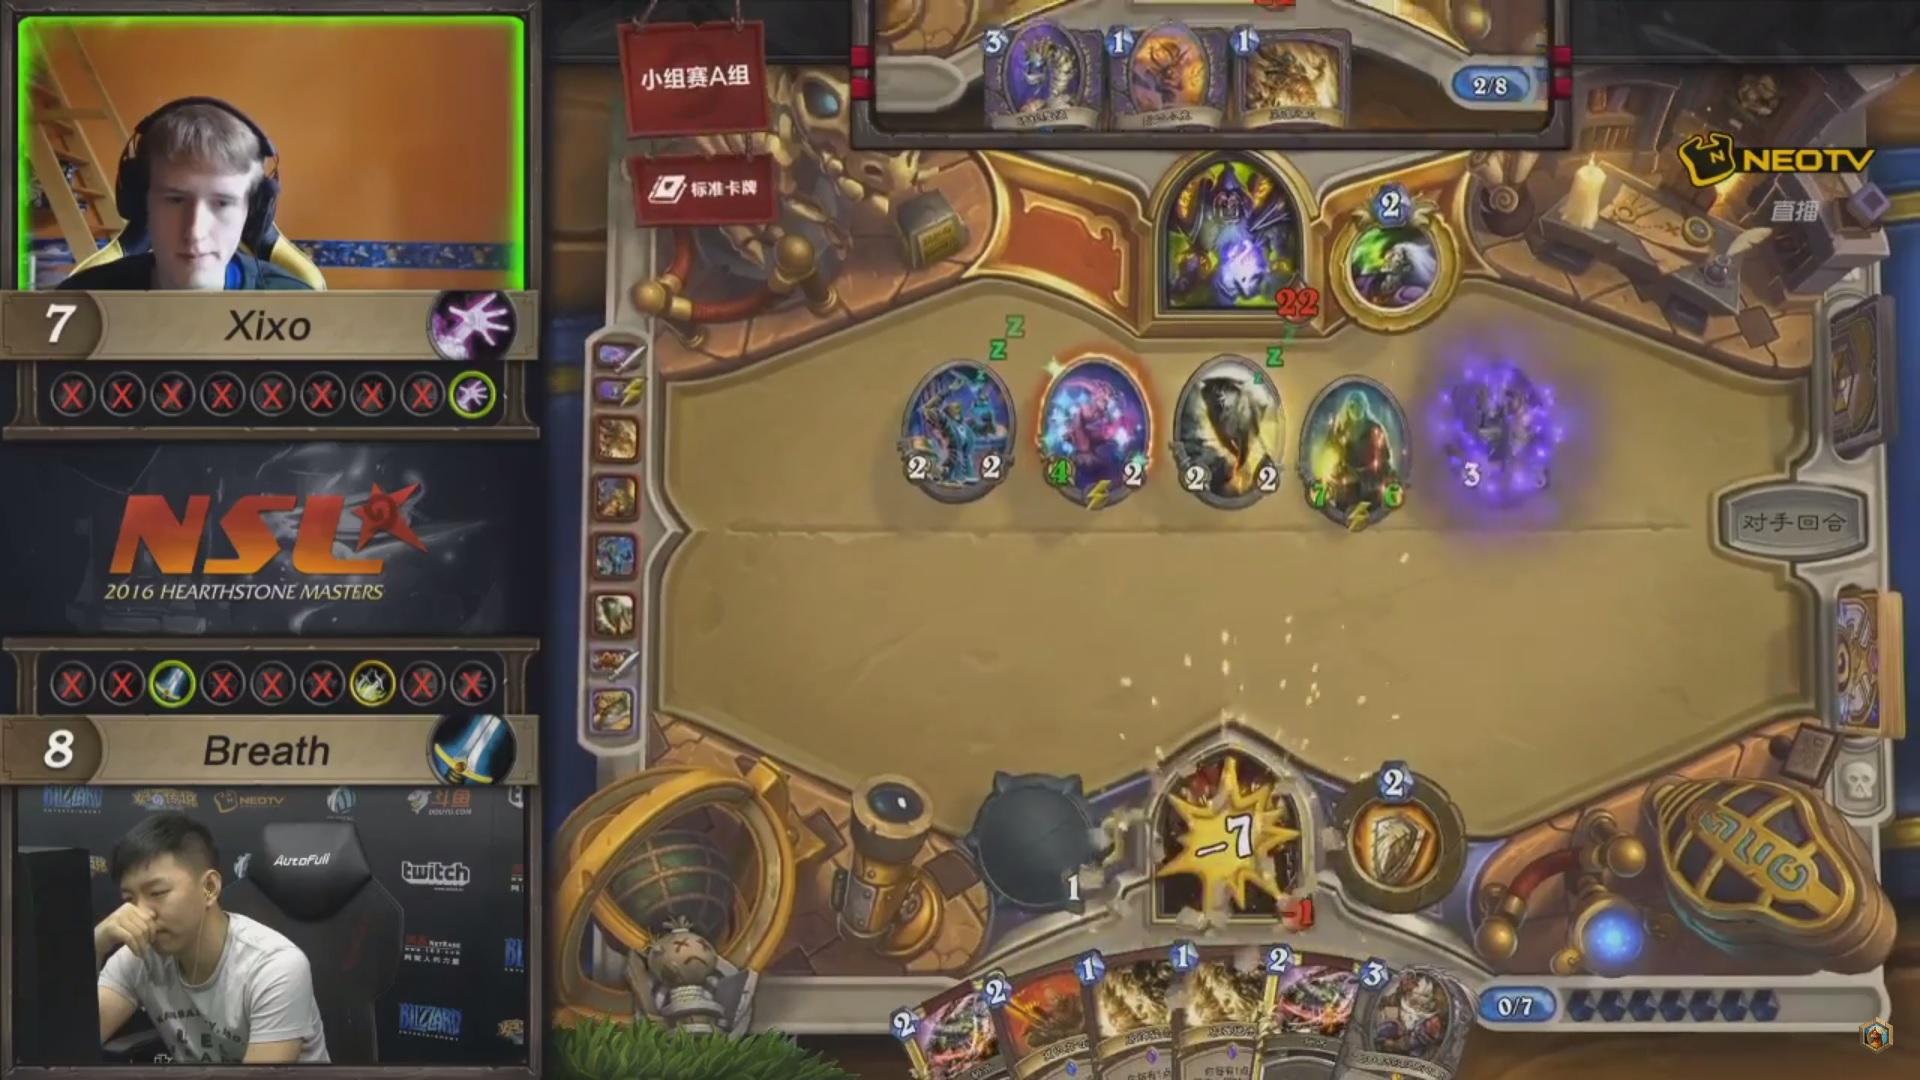 Celestial Invitational screenshot of Xixo winning game 16